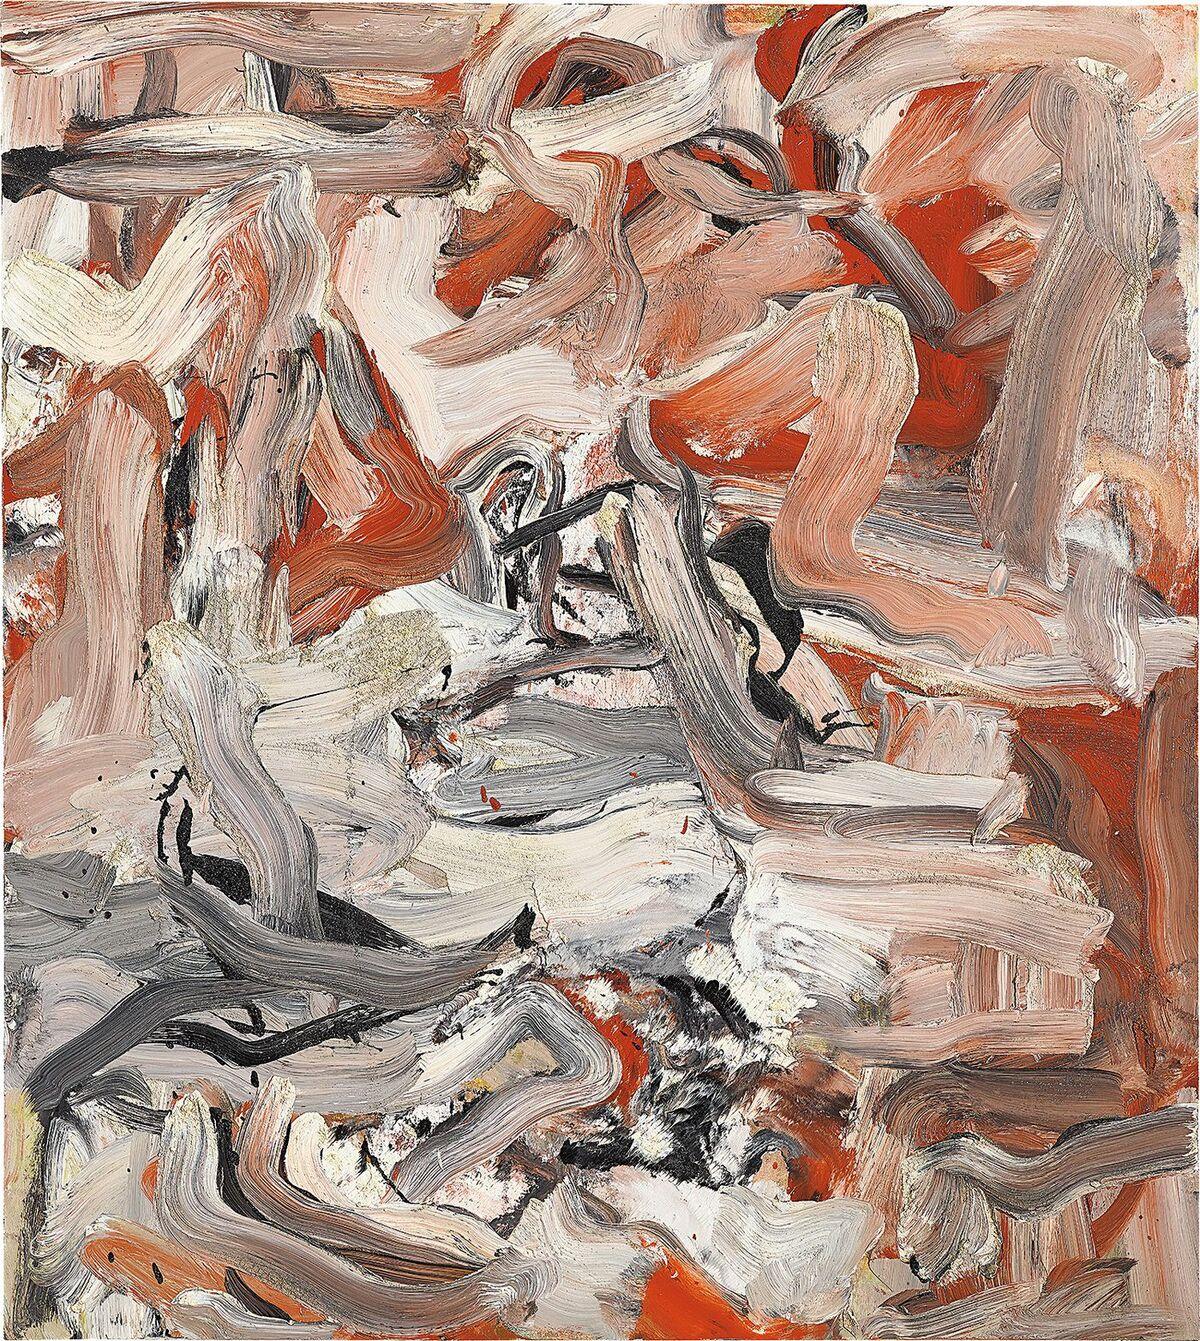 Willem de Kooning, Untitled XVI, 1976. Courtesy of Philips.